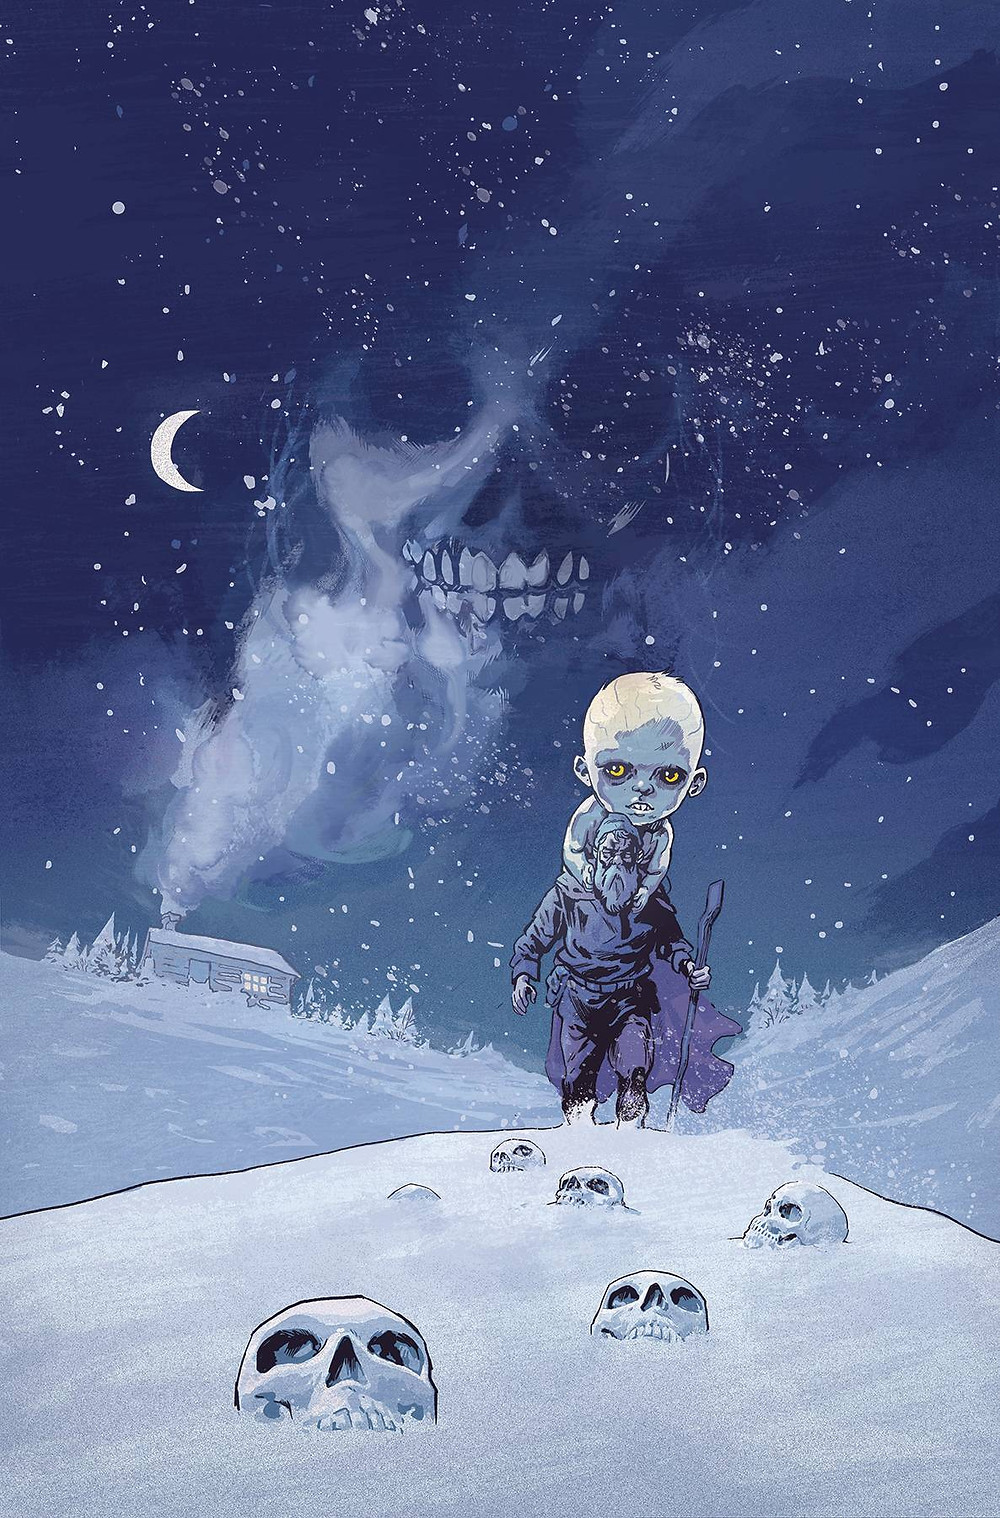 Cover of Storyteller: Ghosts #1